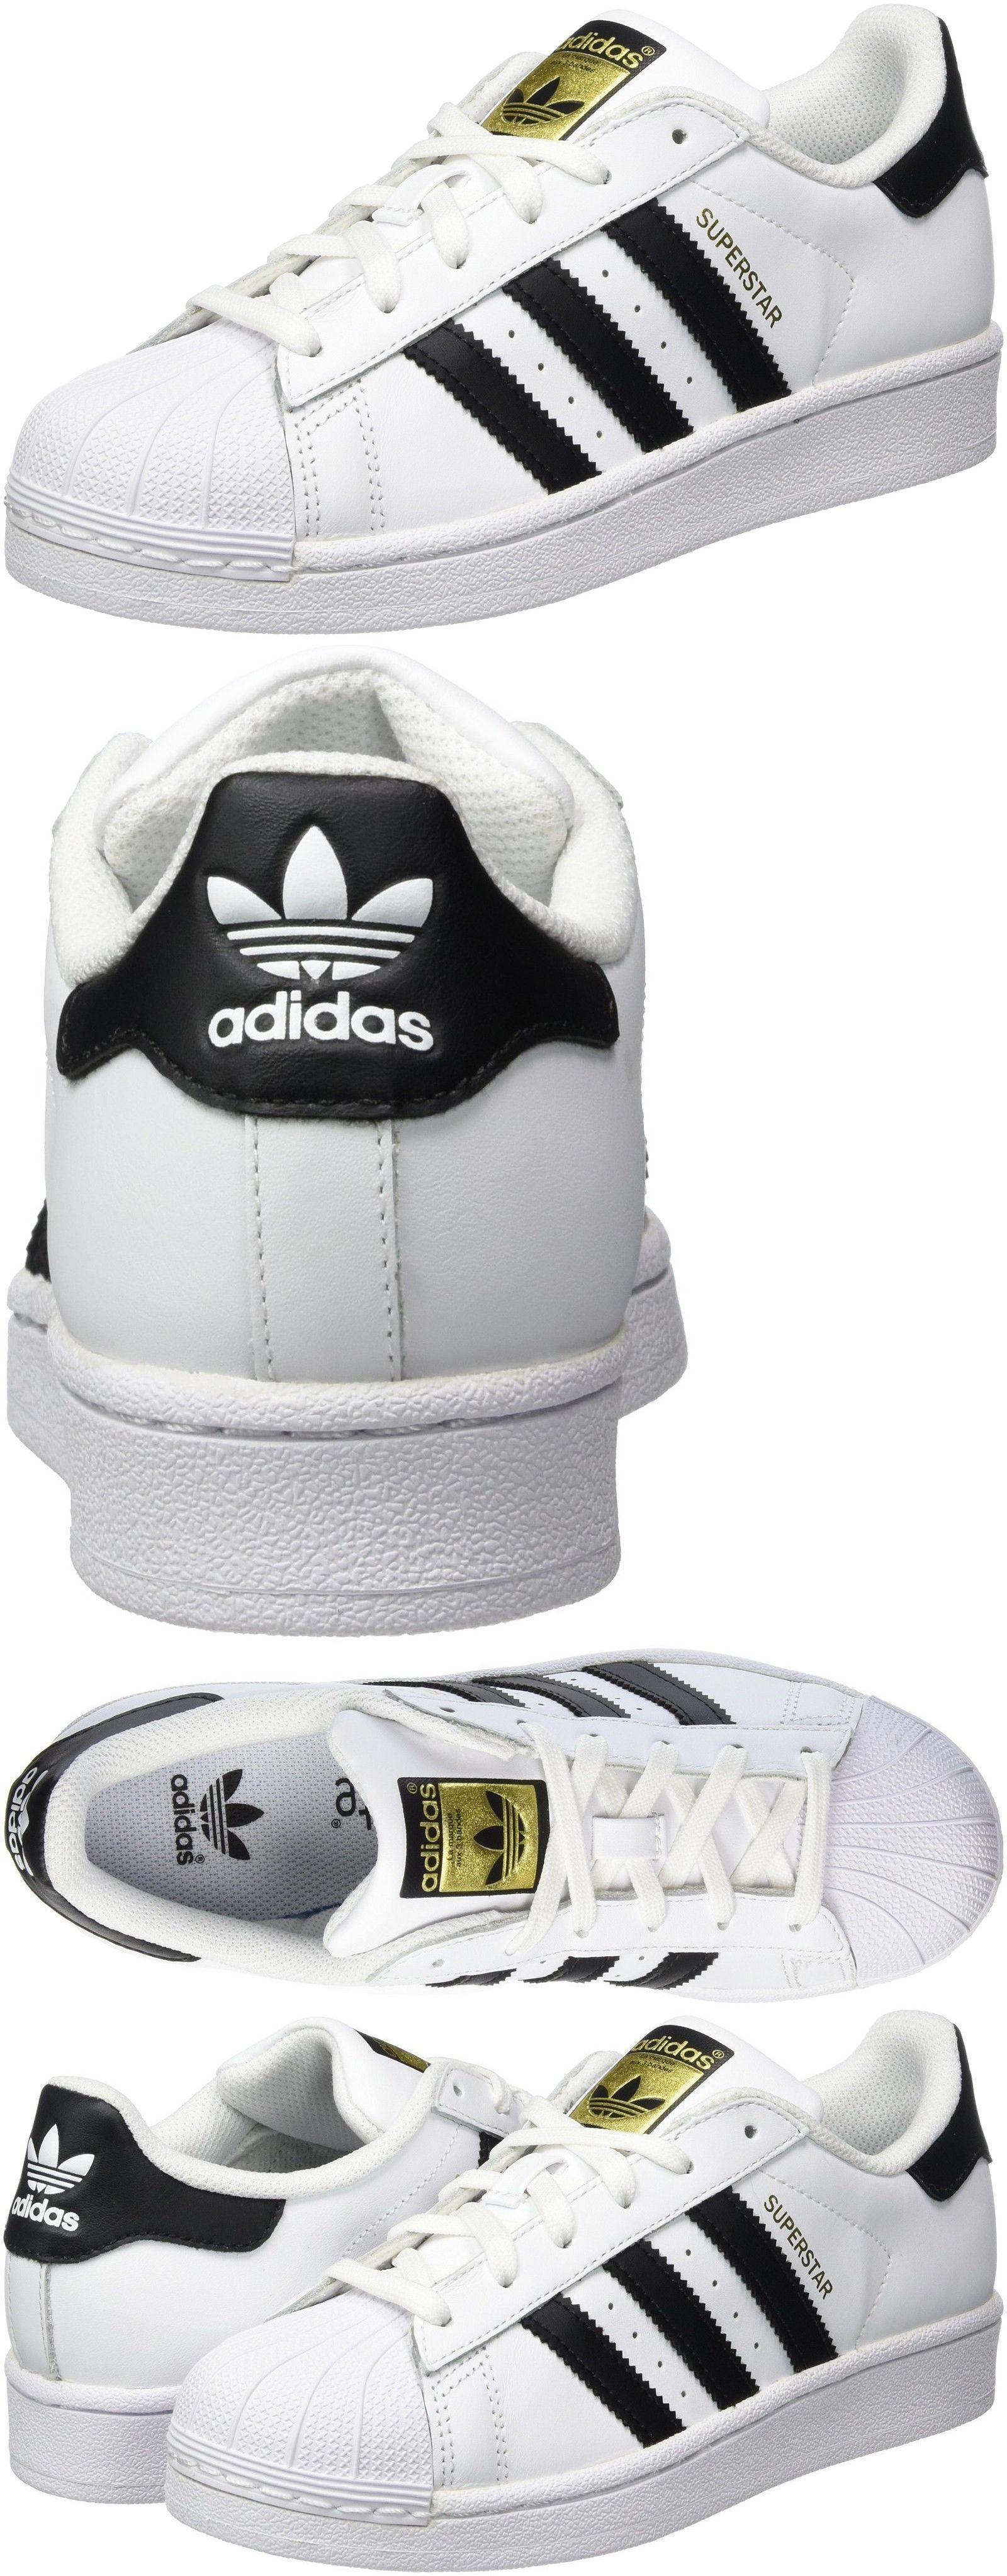 Unisex Scarpe Superstar 155202: Adidas Gioventù Originali Superstar Scarpe Fondazione G. 67b1b2